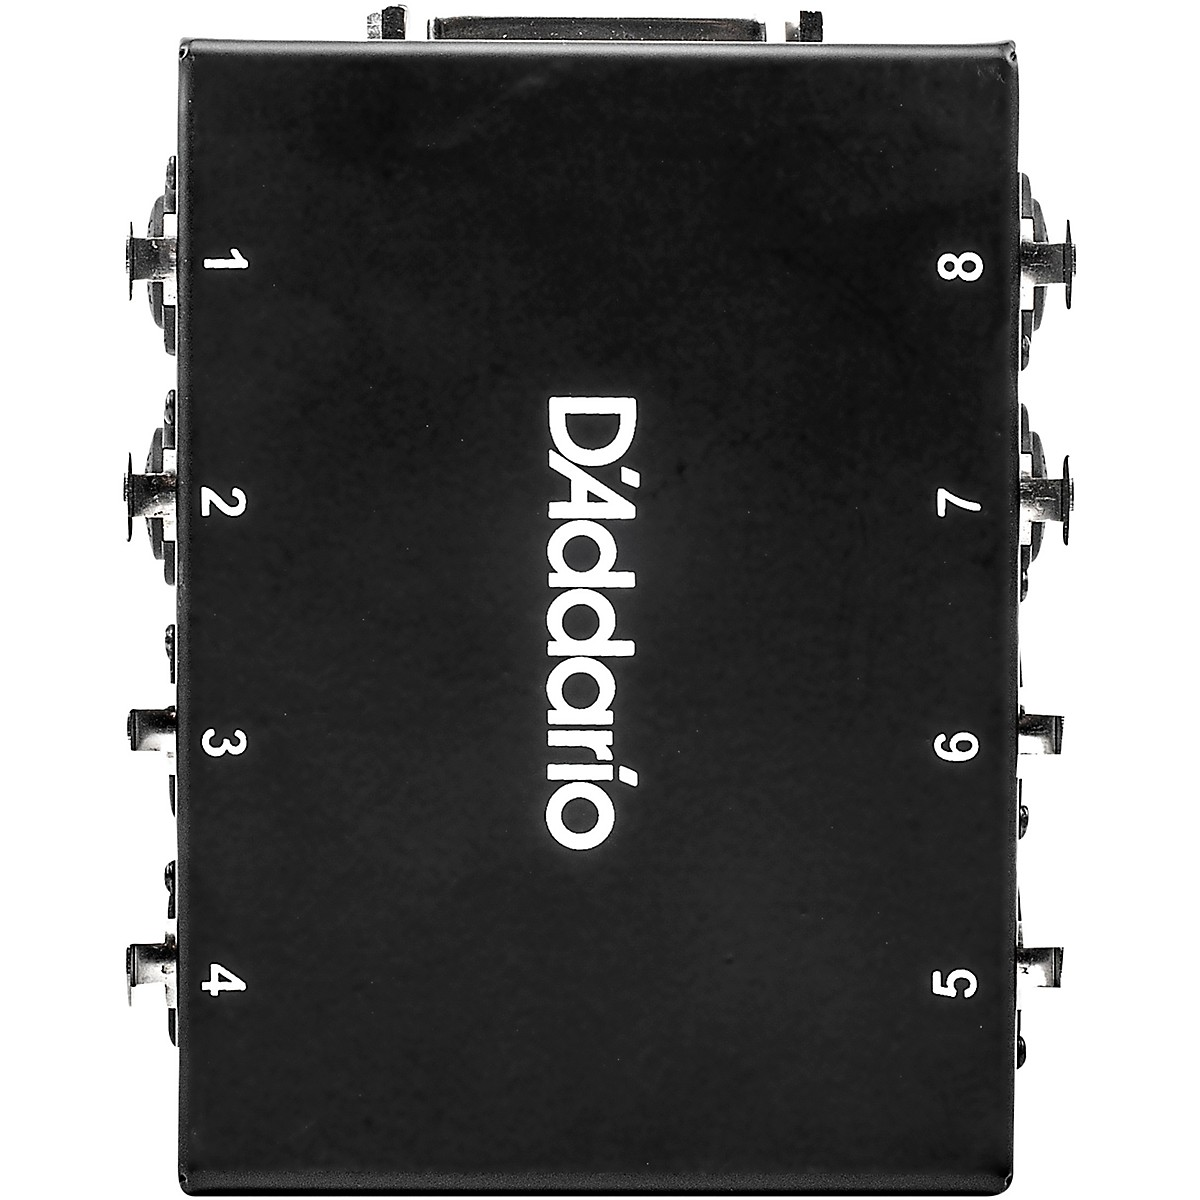 D'Addario Planet Waves Modular Snake Stage Box